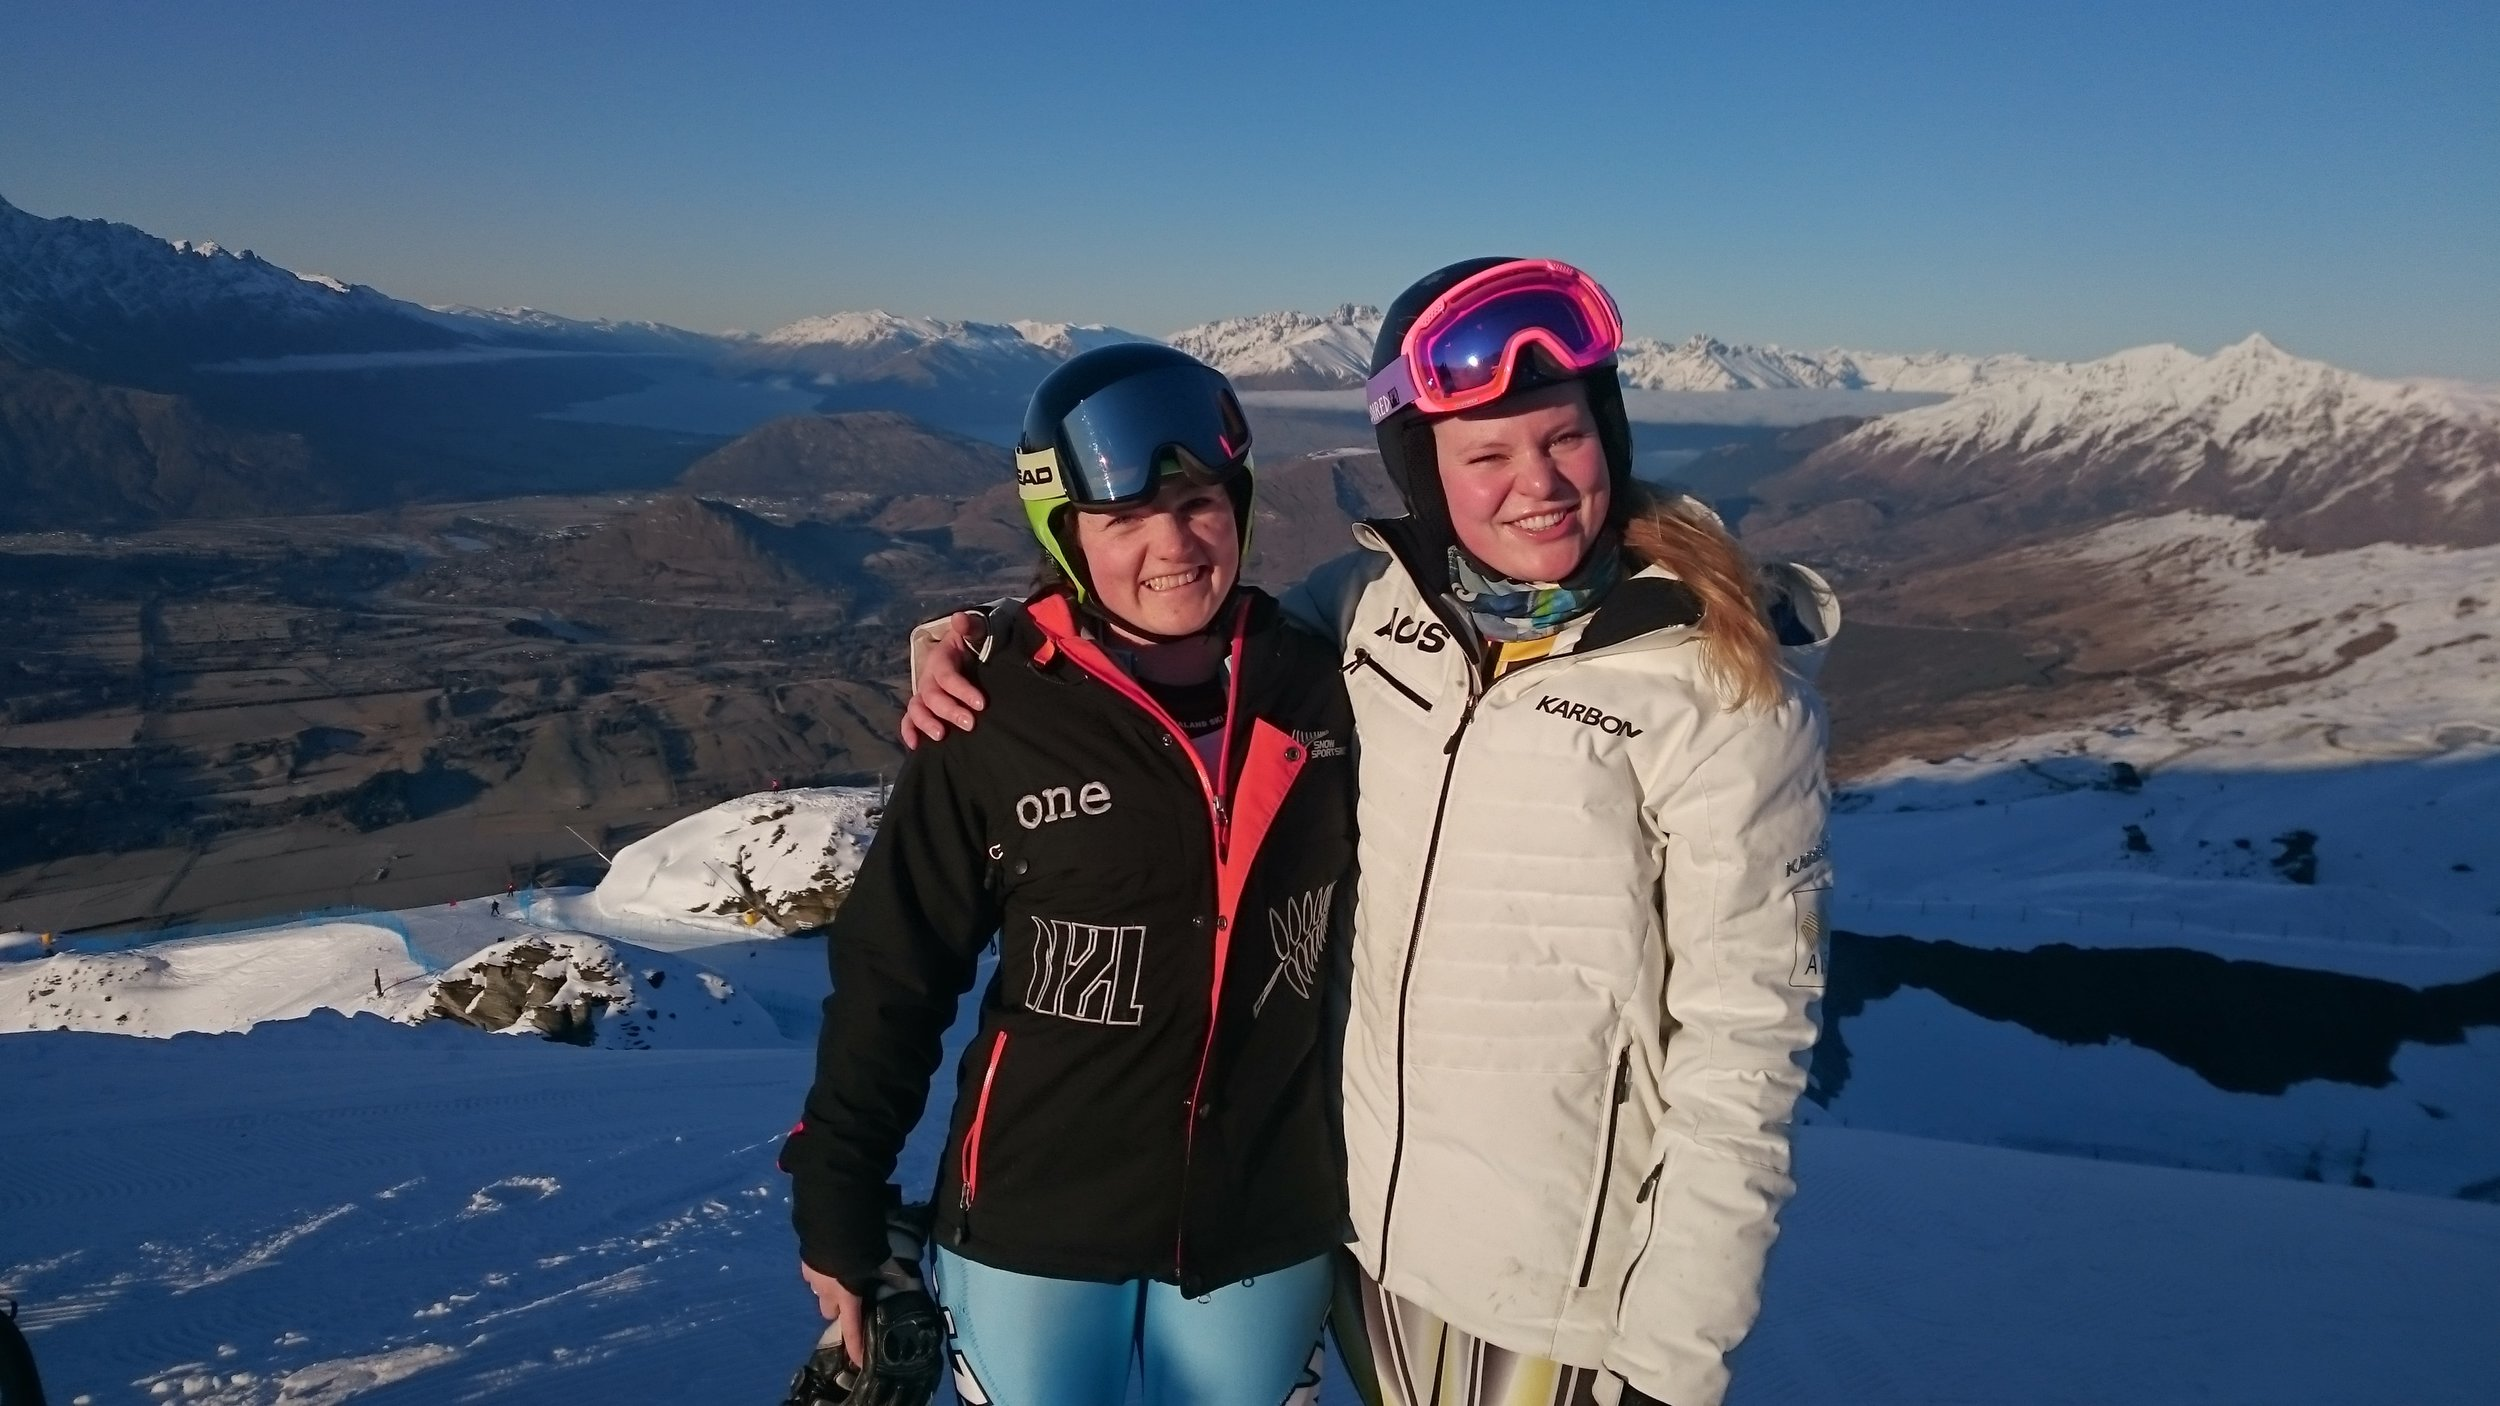 With Aussie team member Greta Small